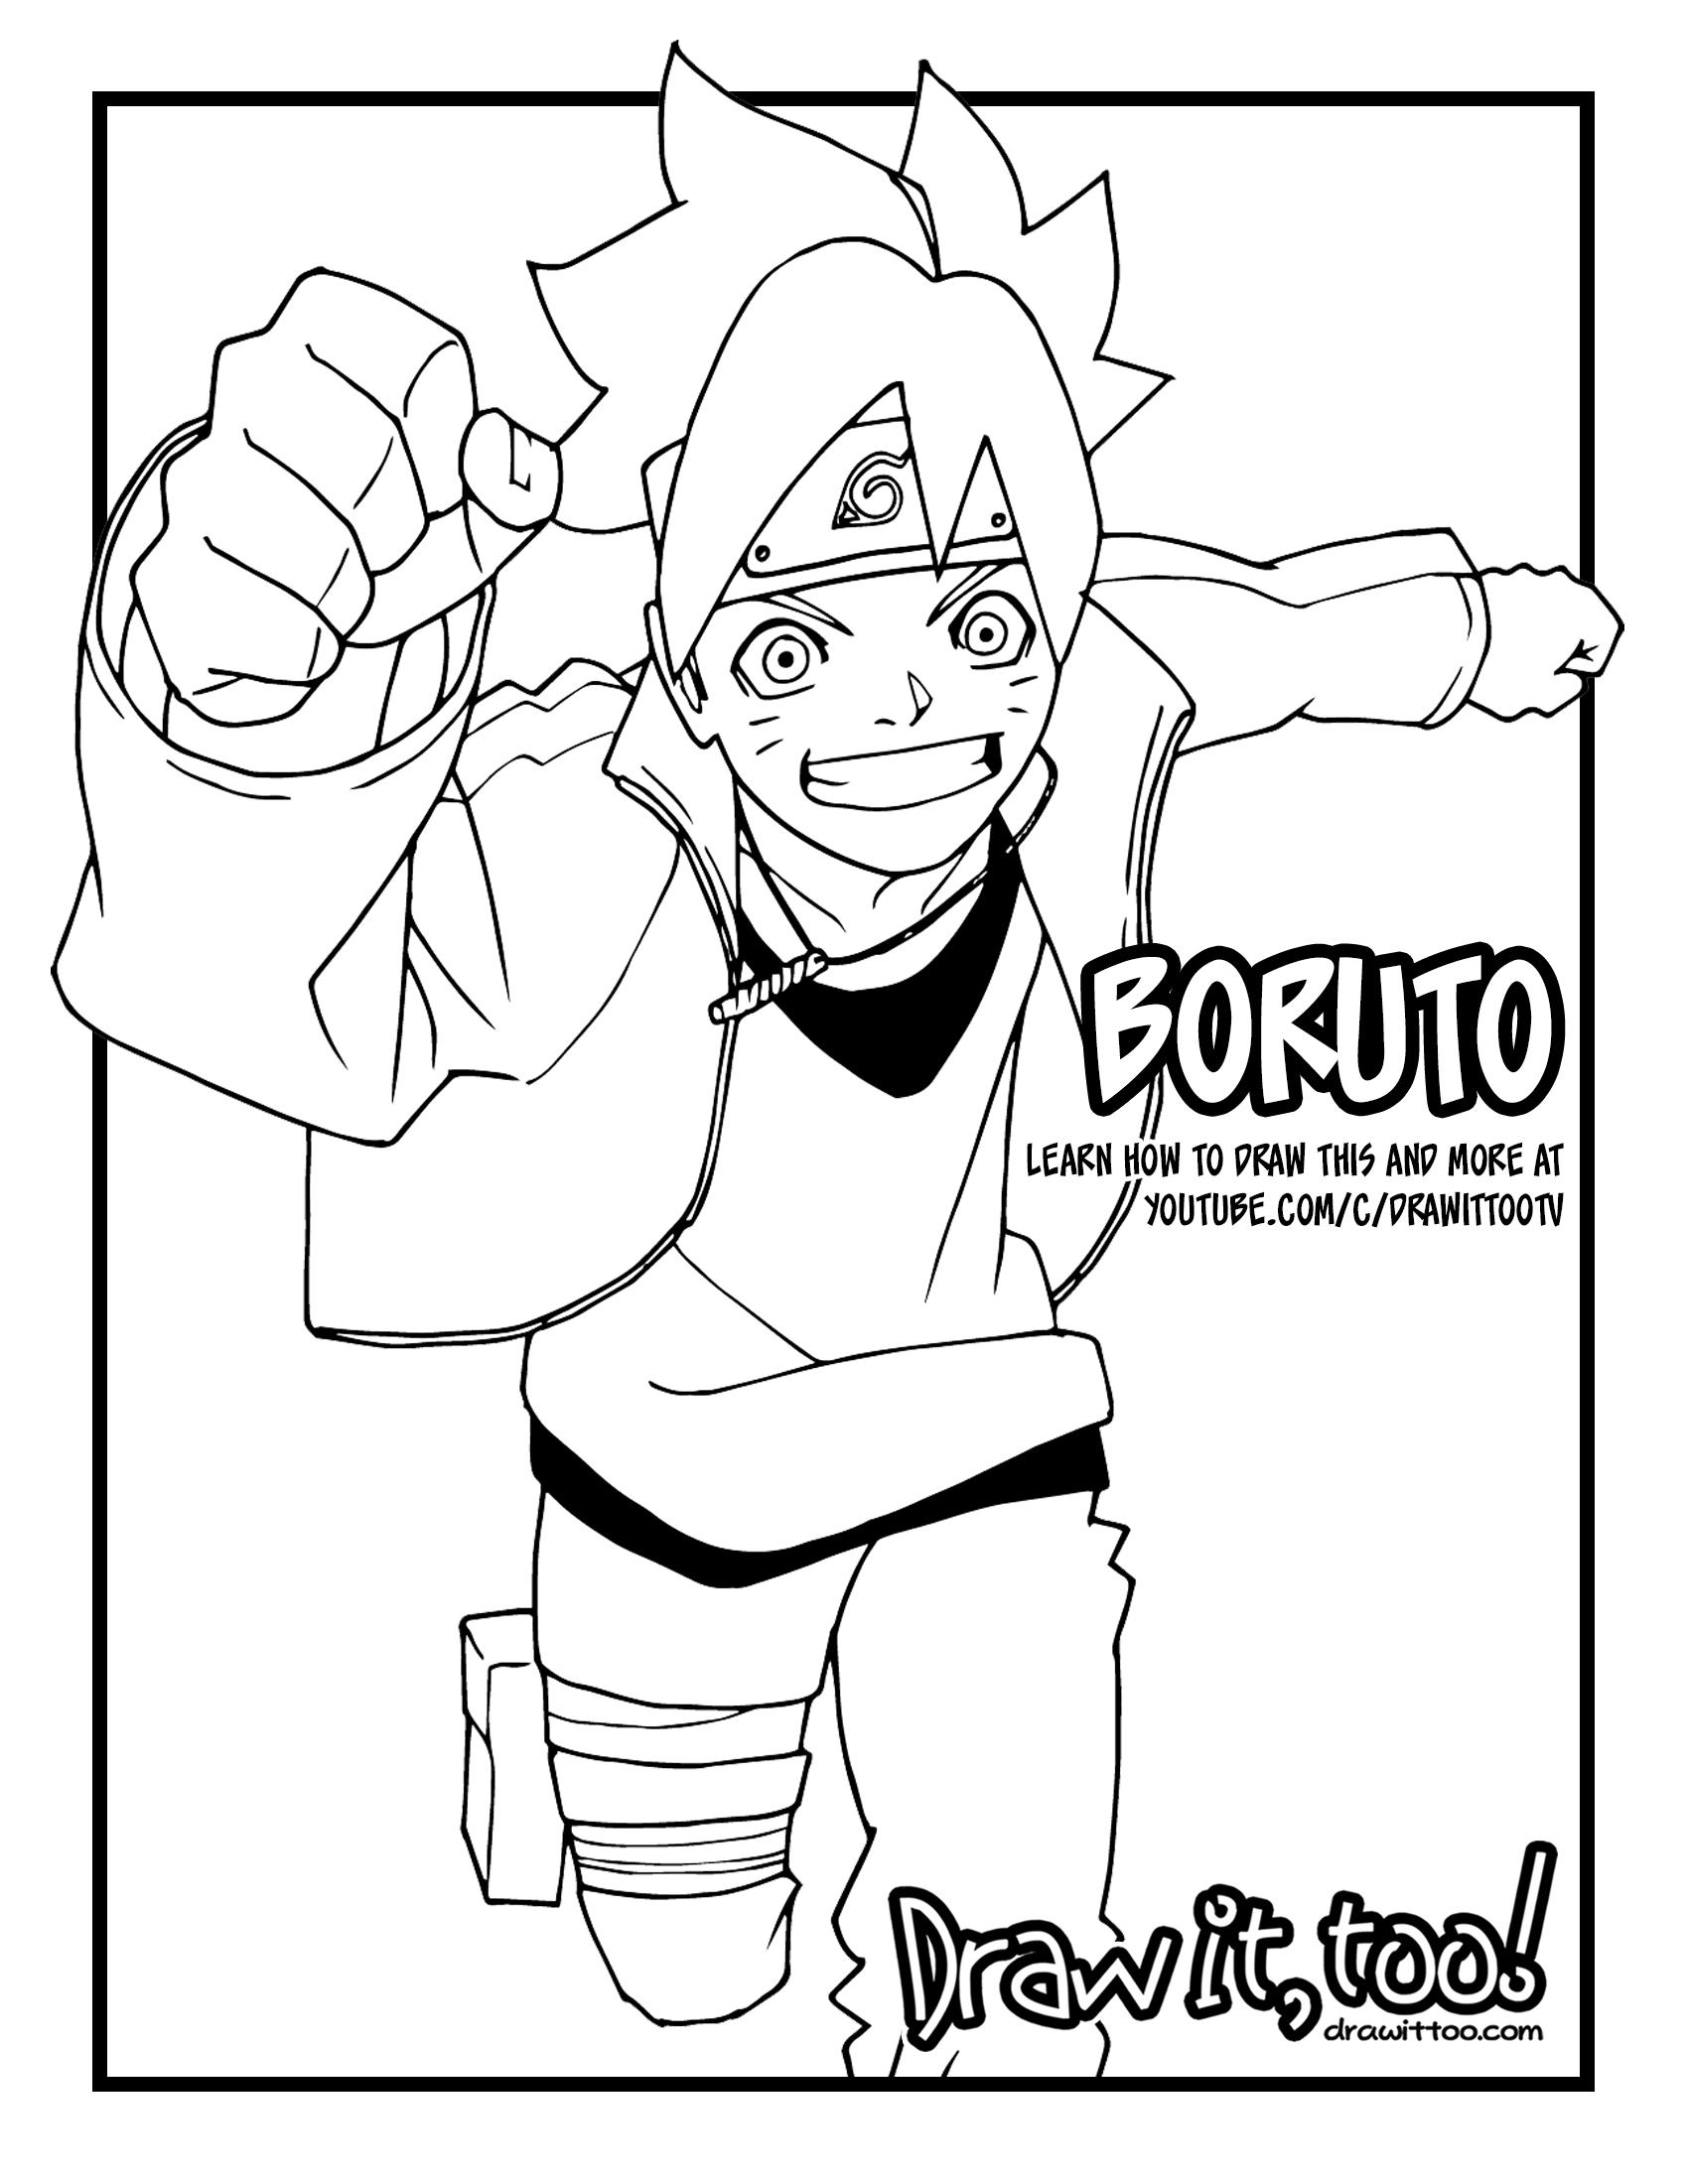 Boruto Naruto Next Generations Coloring Pages Novocom Top